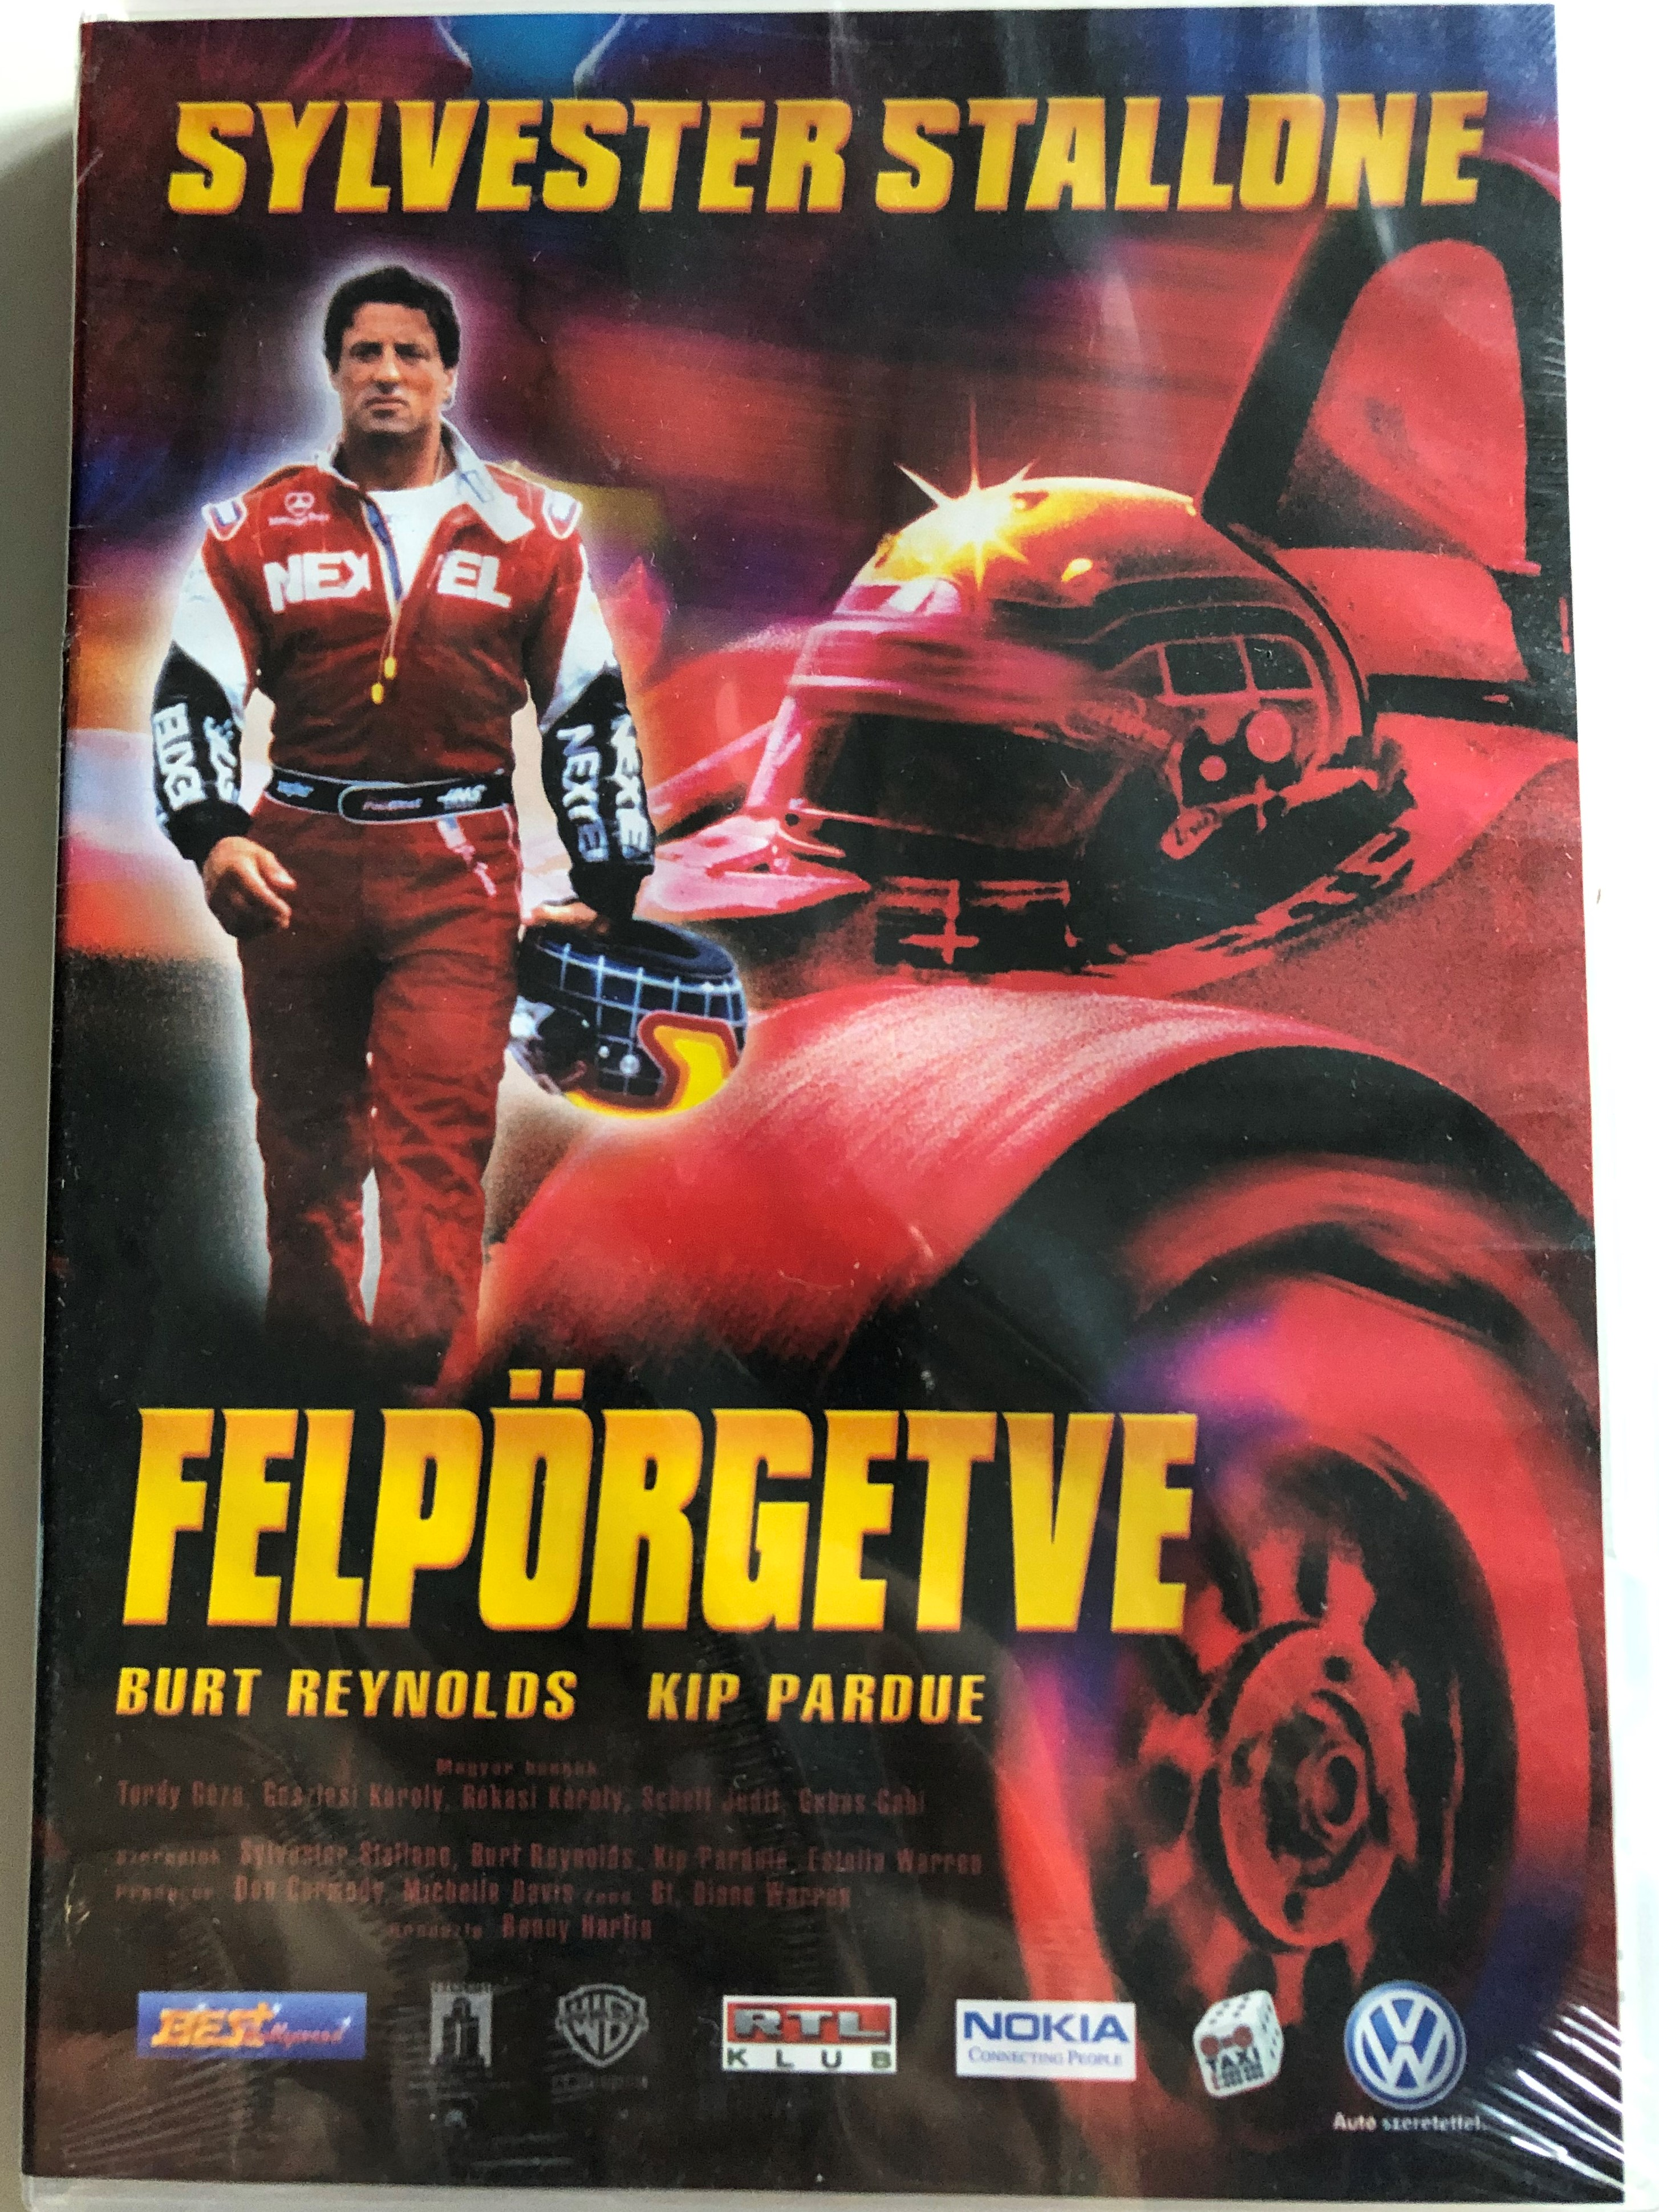 driven-dvd-2001-felp-rgetve-directed-by-renny-harlin-1.jpg